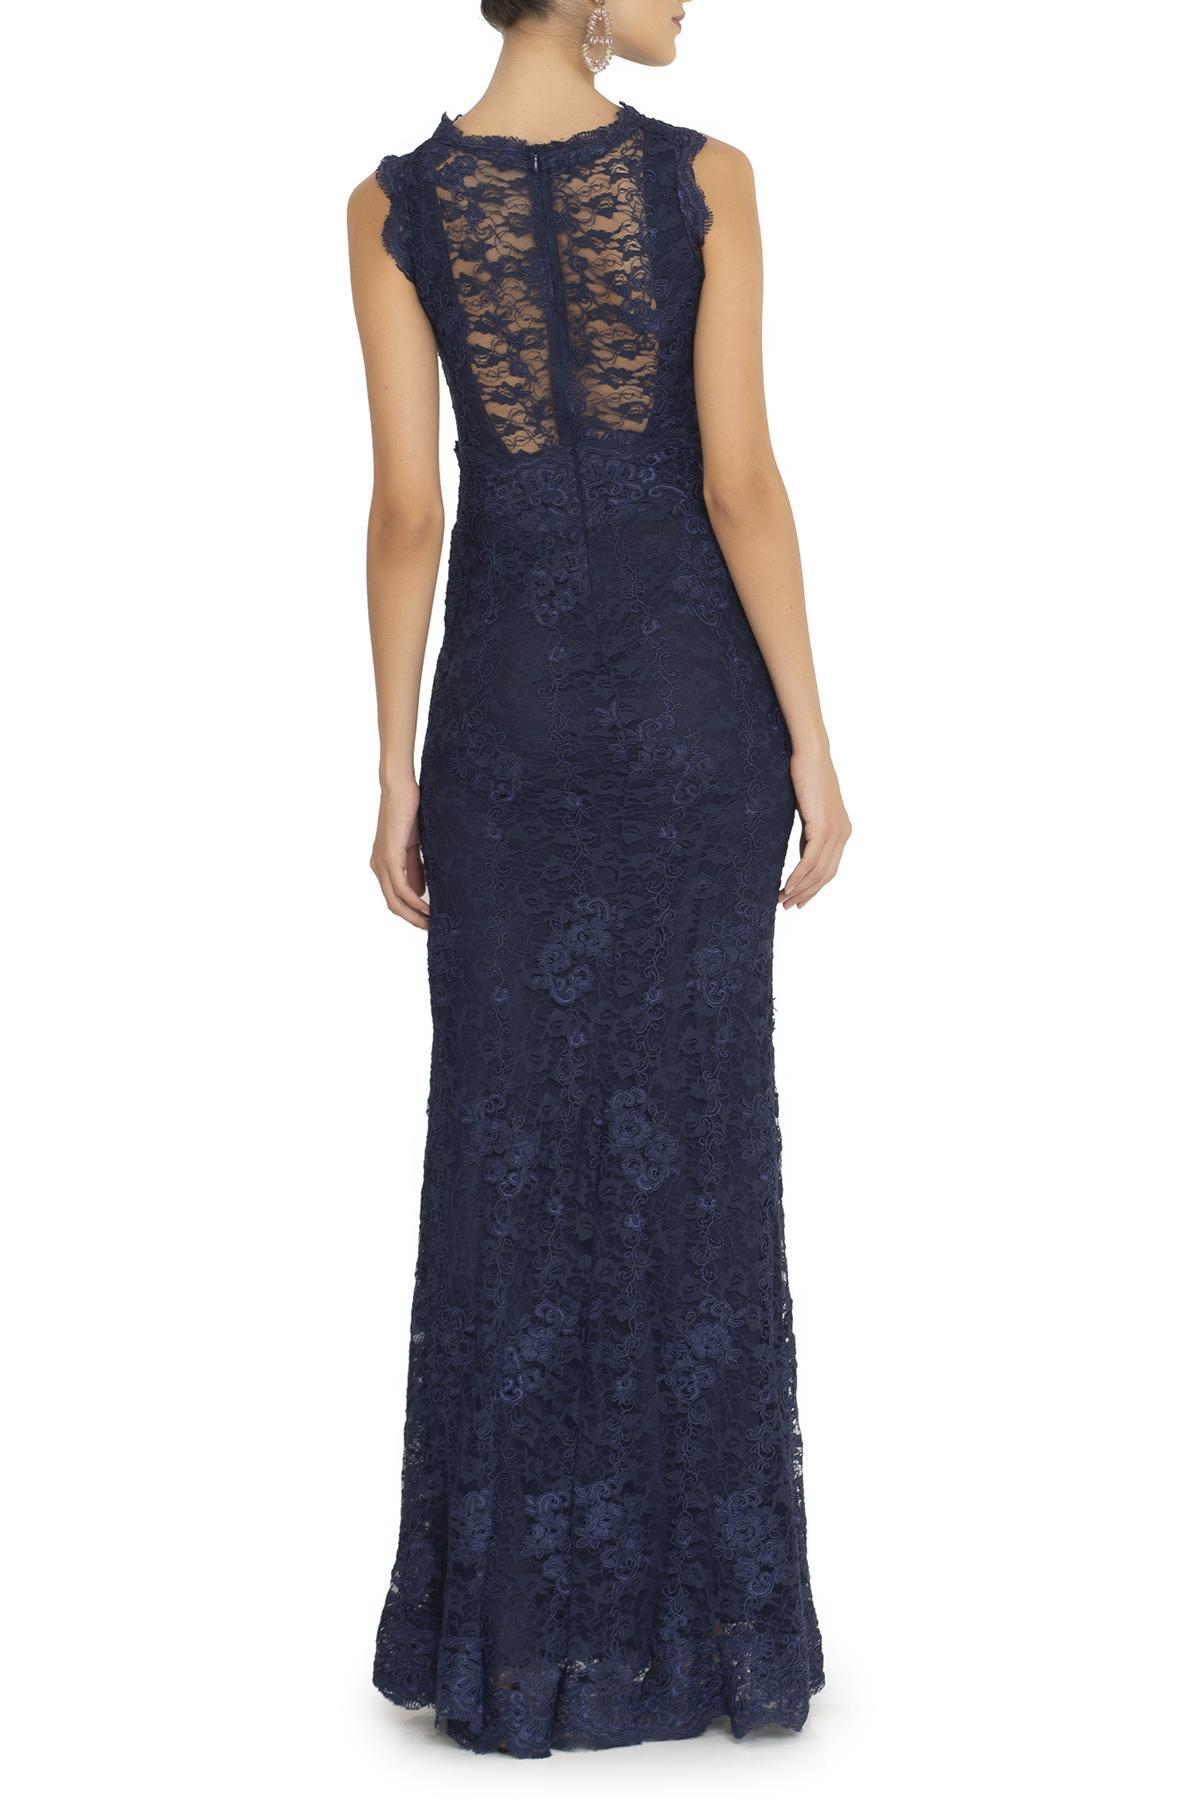 Vestido Lucina Blue Anamaria Couture